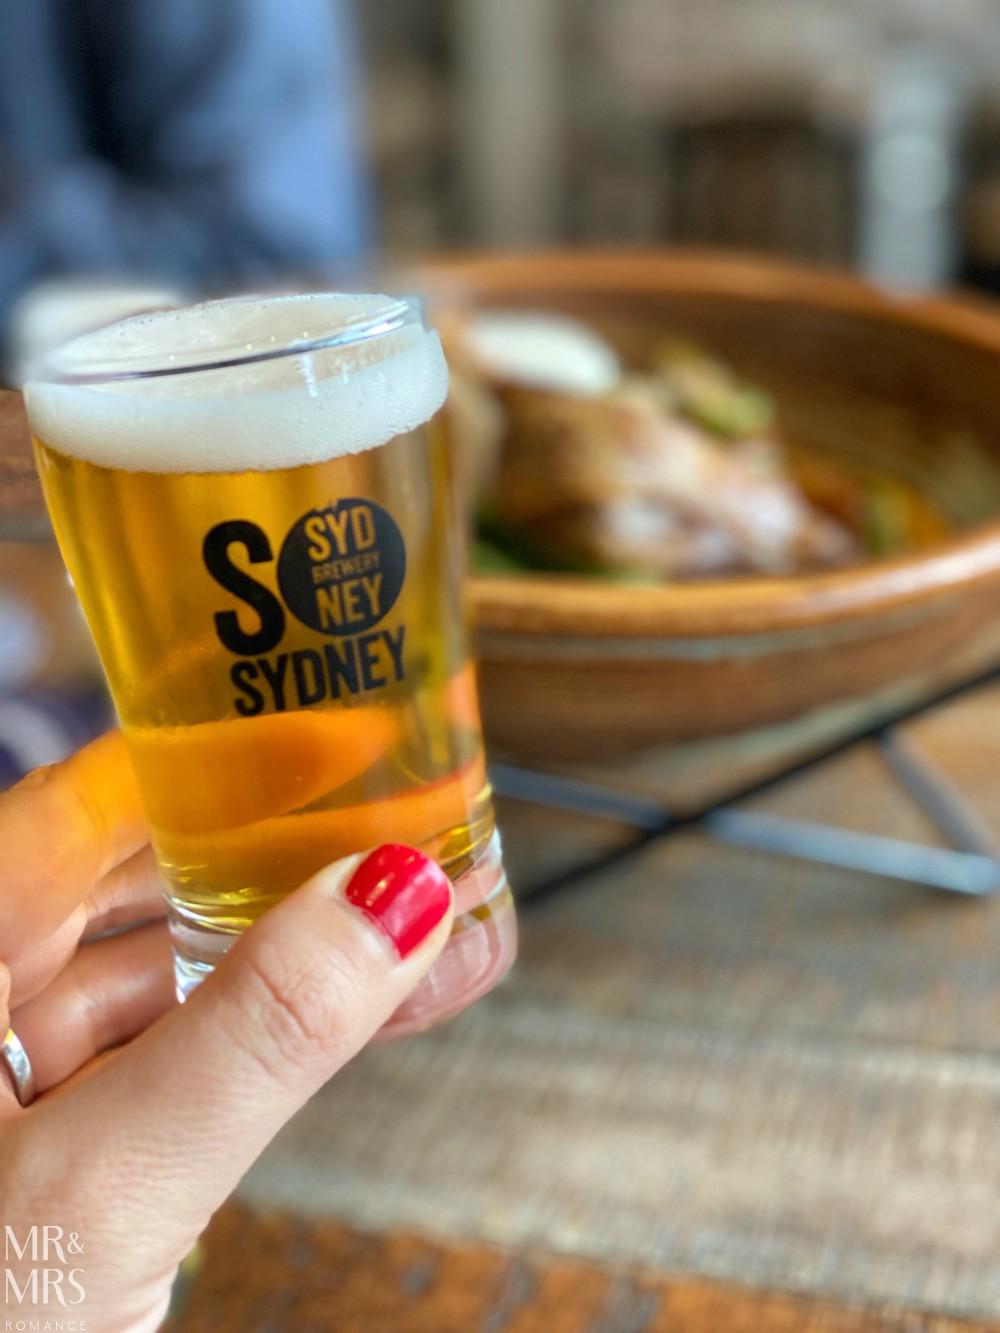 Sydney Brewery - Albion Ale